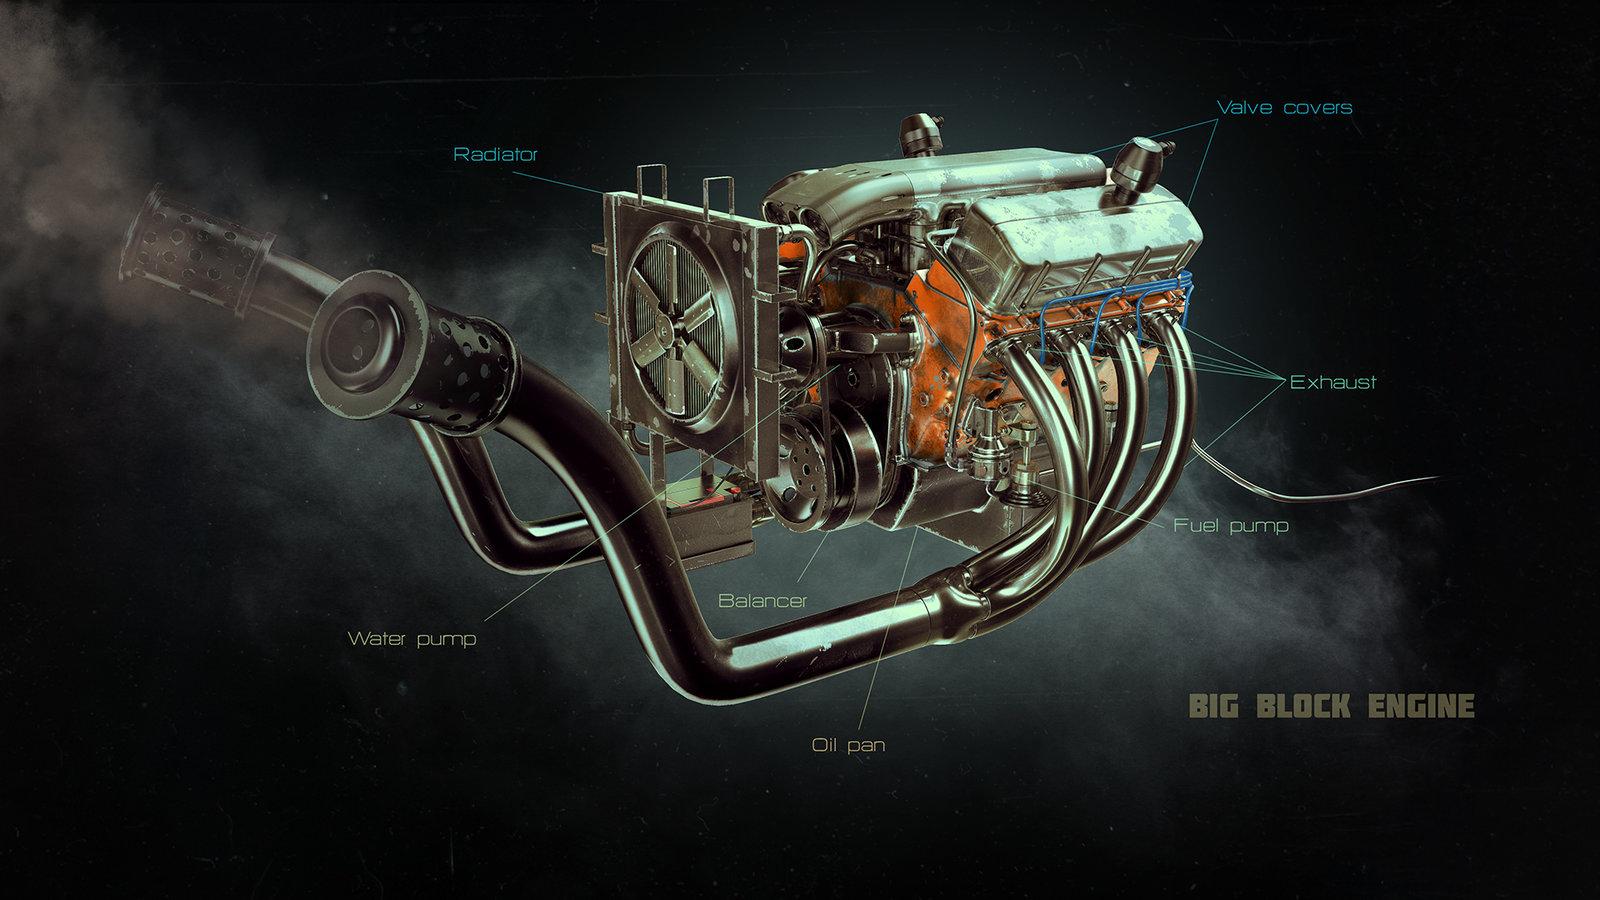 Big Block Engine